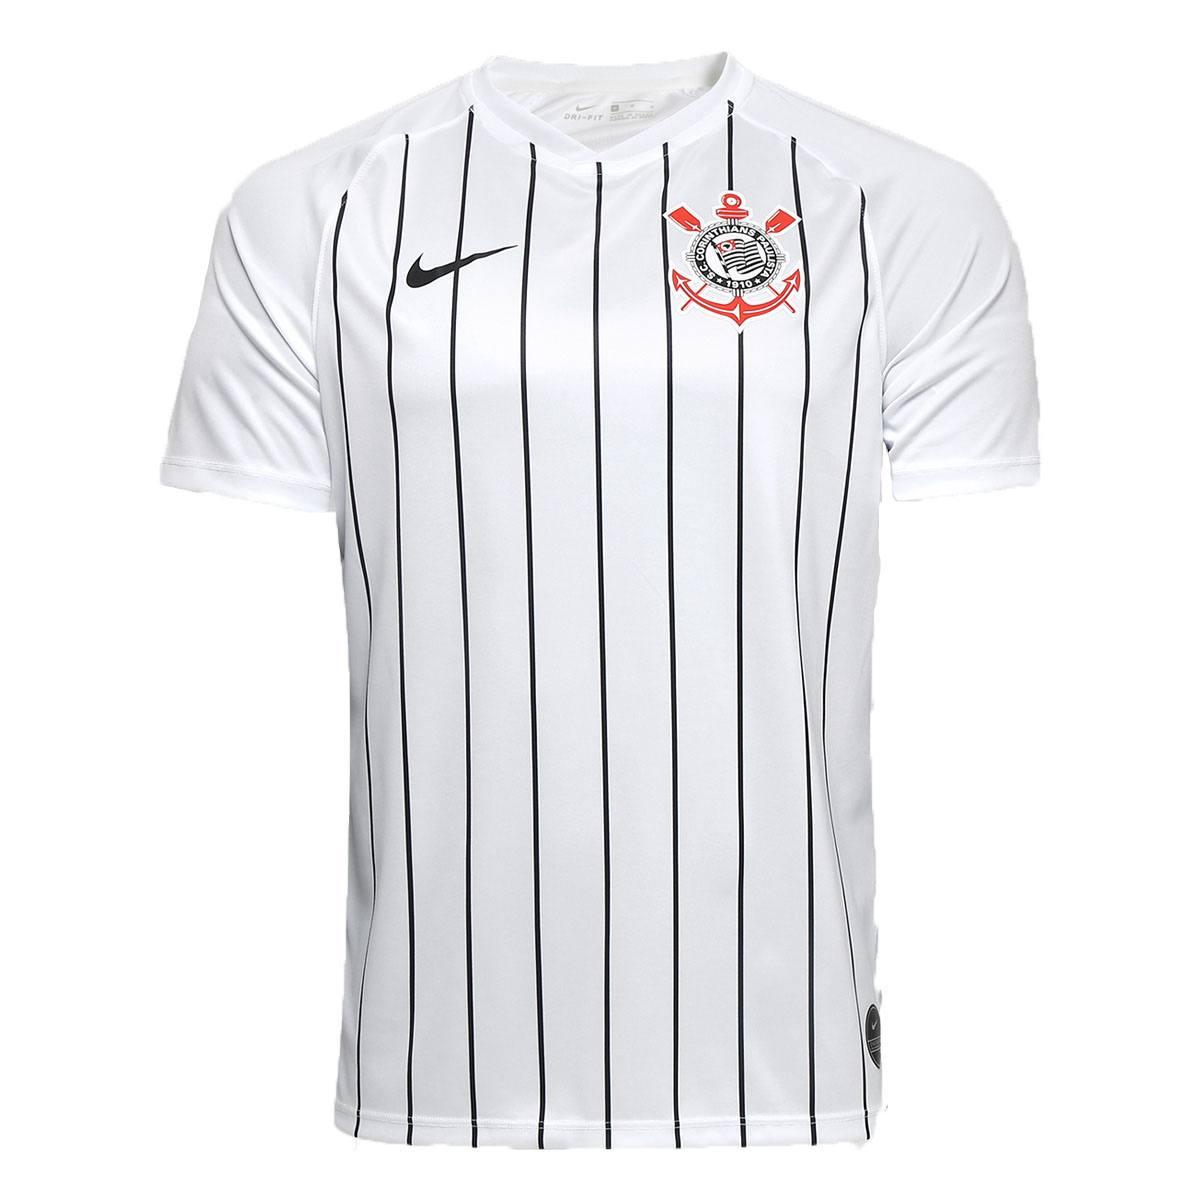 Camisa Corinthians I 19/20 s/nº Nike Masculina